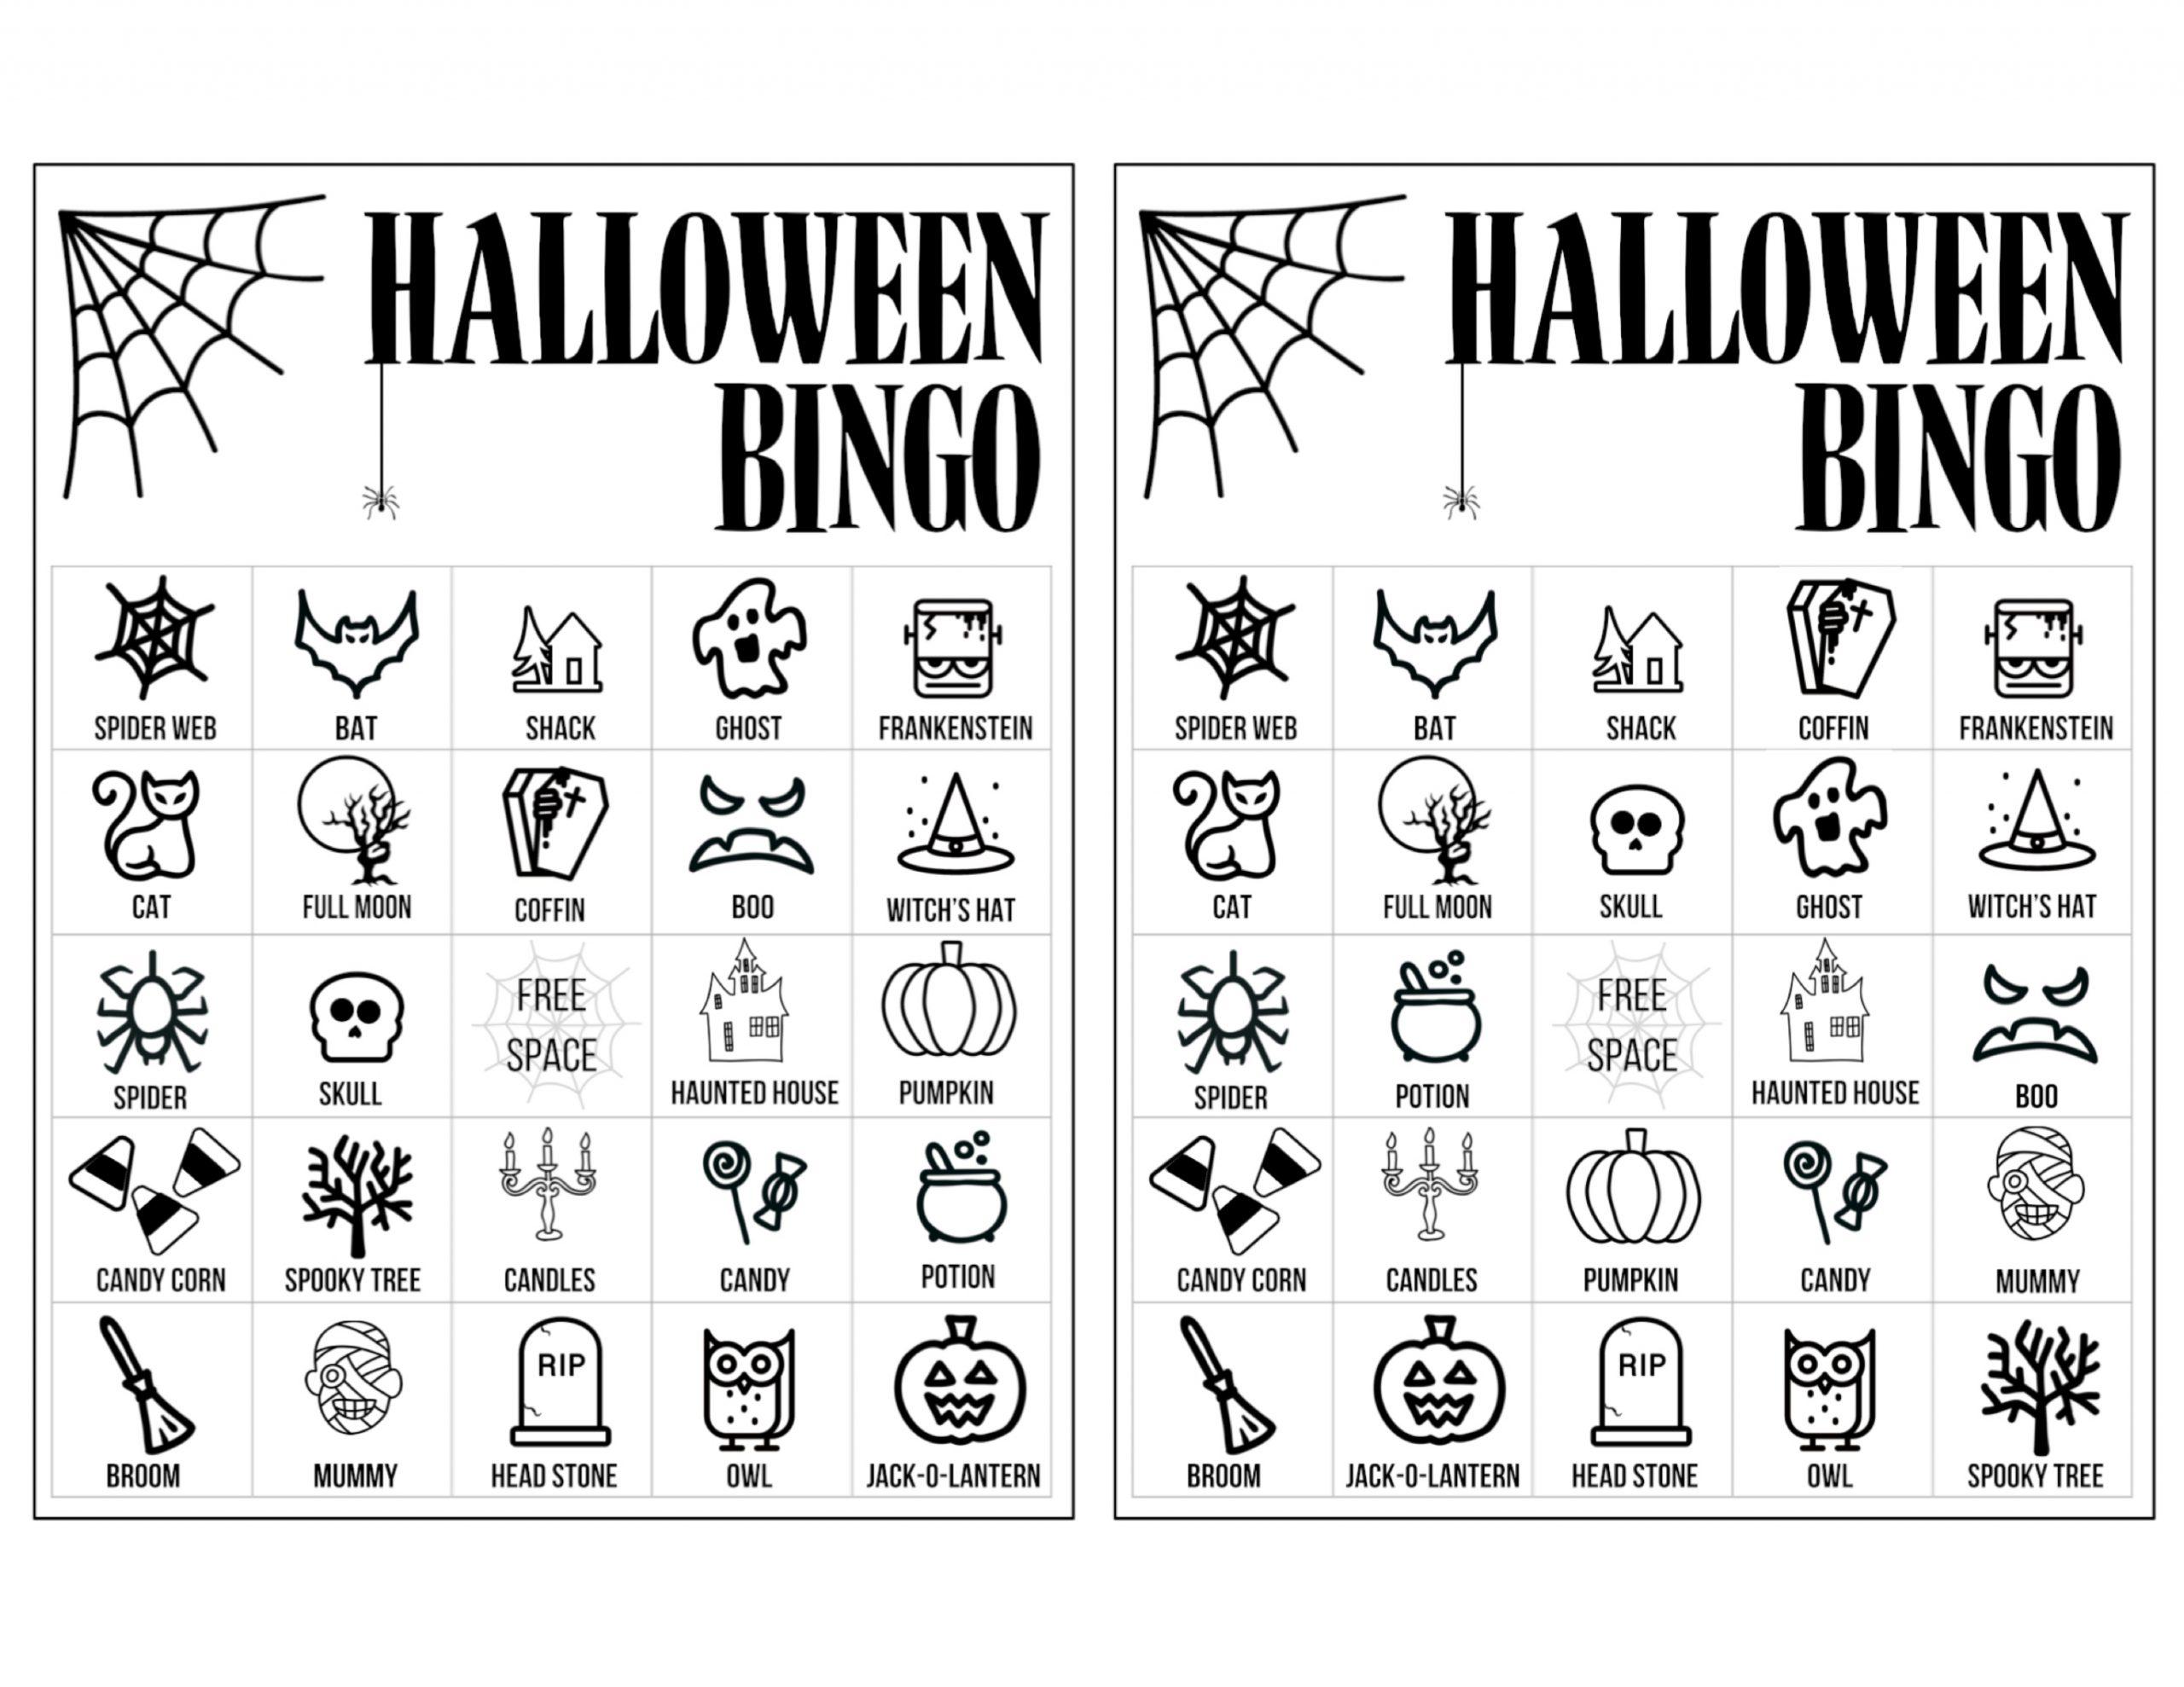 Halloween Bingo Printable Game Cards Template - Paper Trail